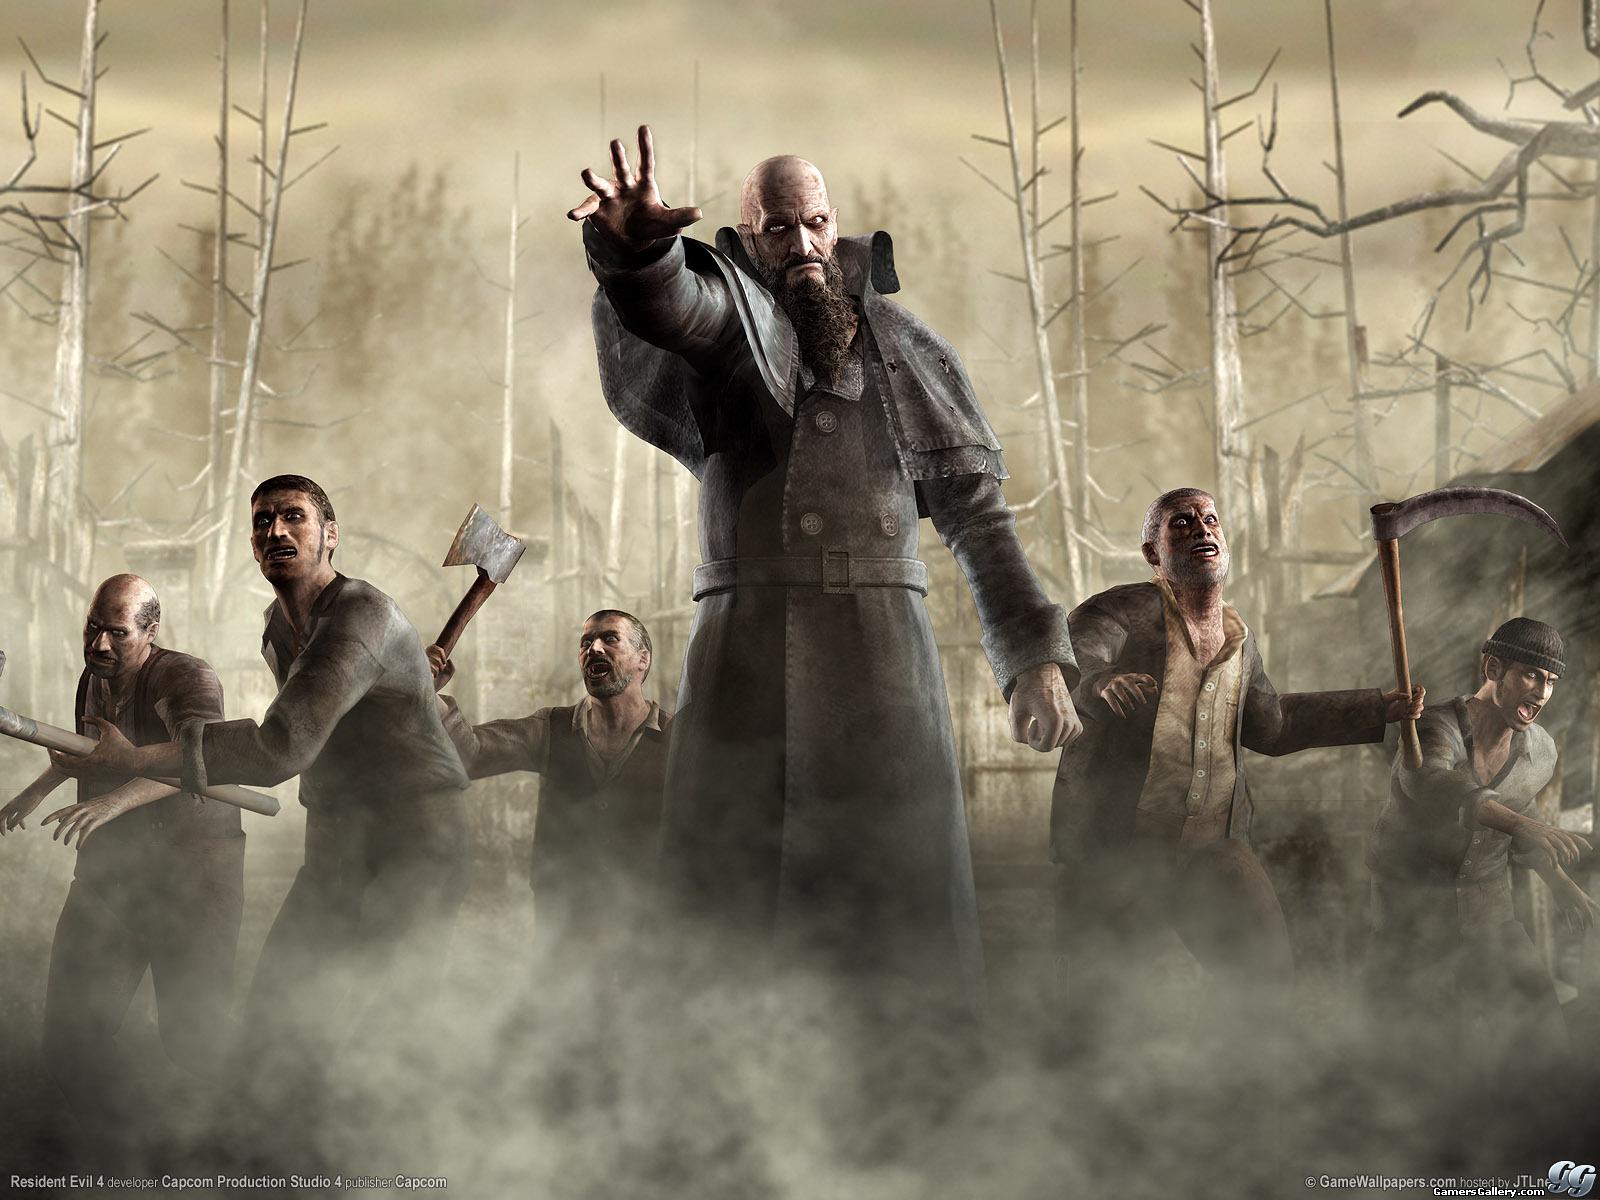 http://4.bp.blogspot.com/-LoDlm-BxOPg/UHLyFUTKIpI/AAAAAAAAAnA/_NDg16Cenfw/s1600/Resident-Evil-wallpaper-2.jpg